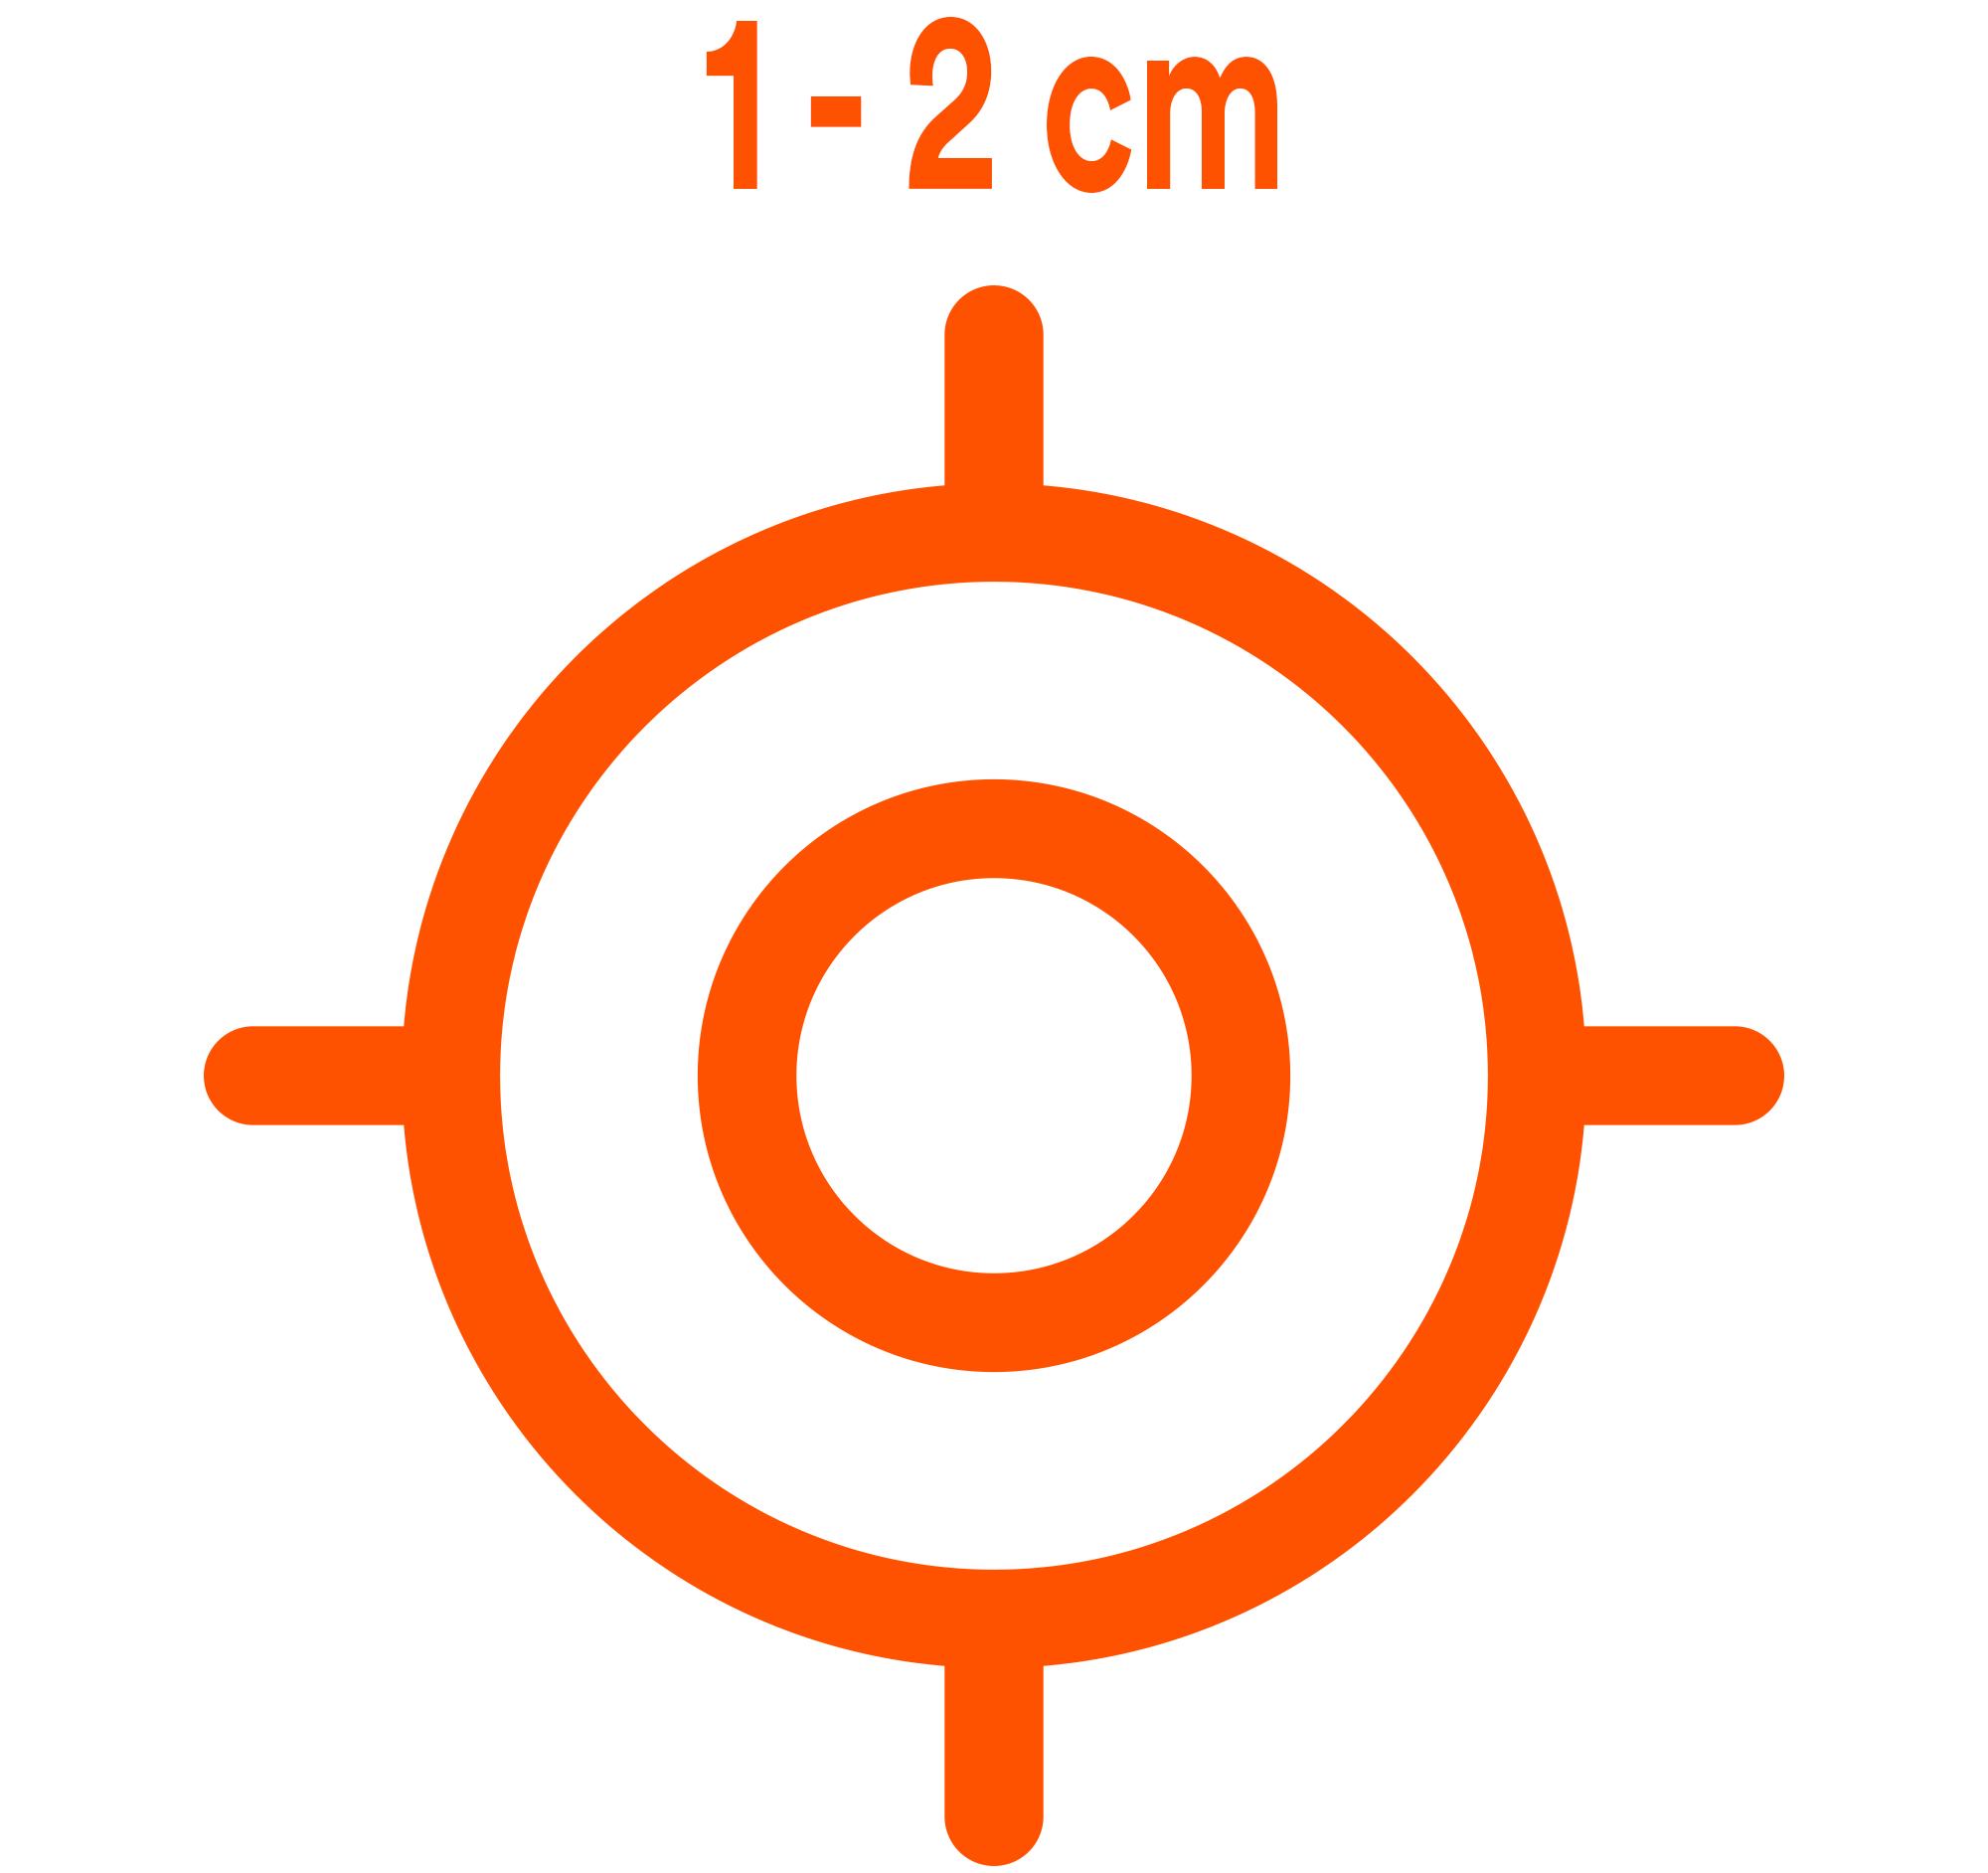 haute-precision-1-2-cm